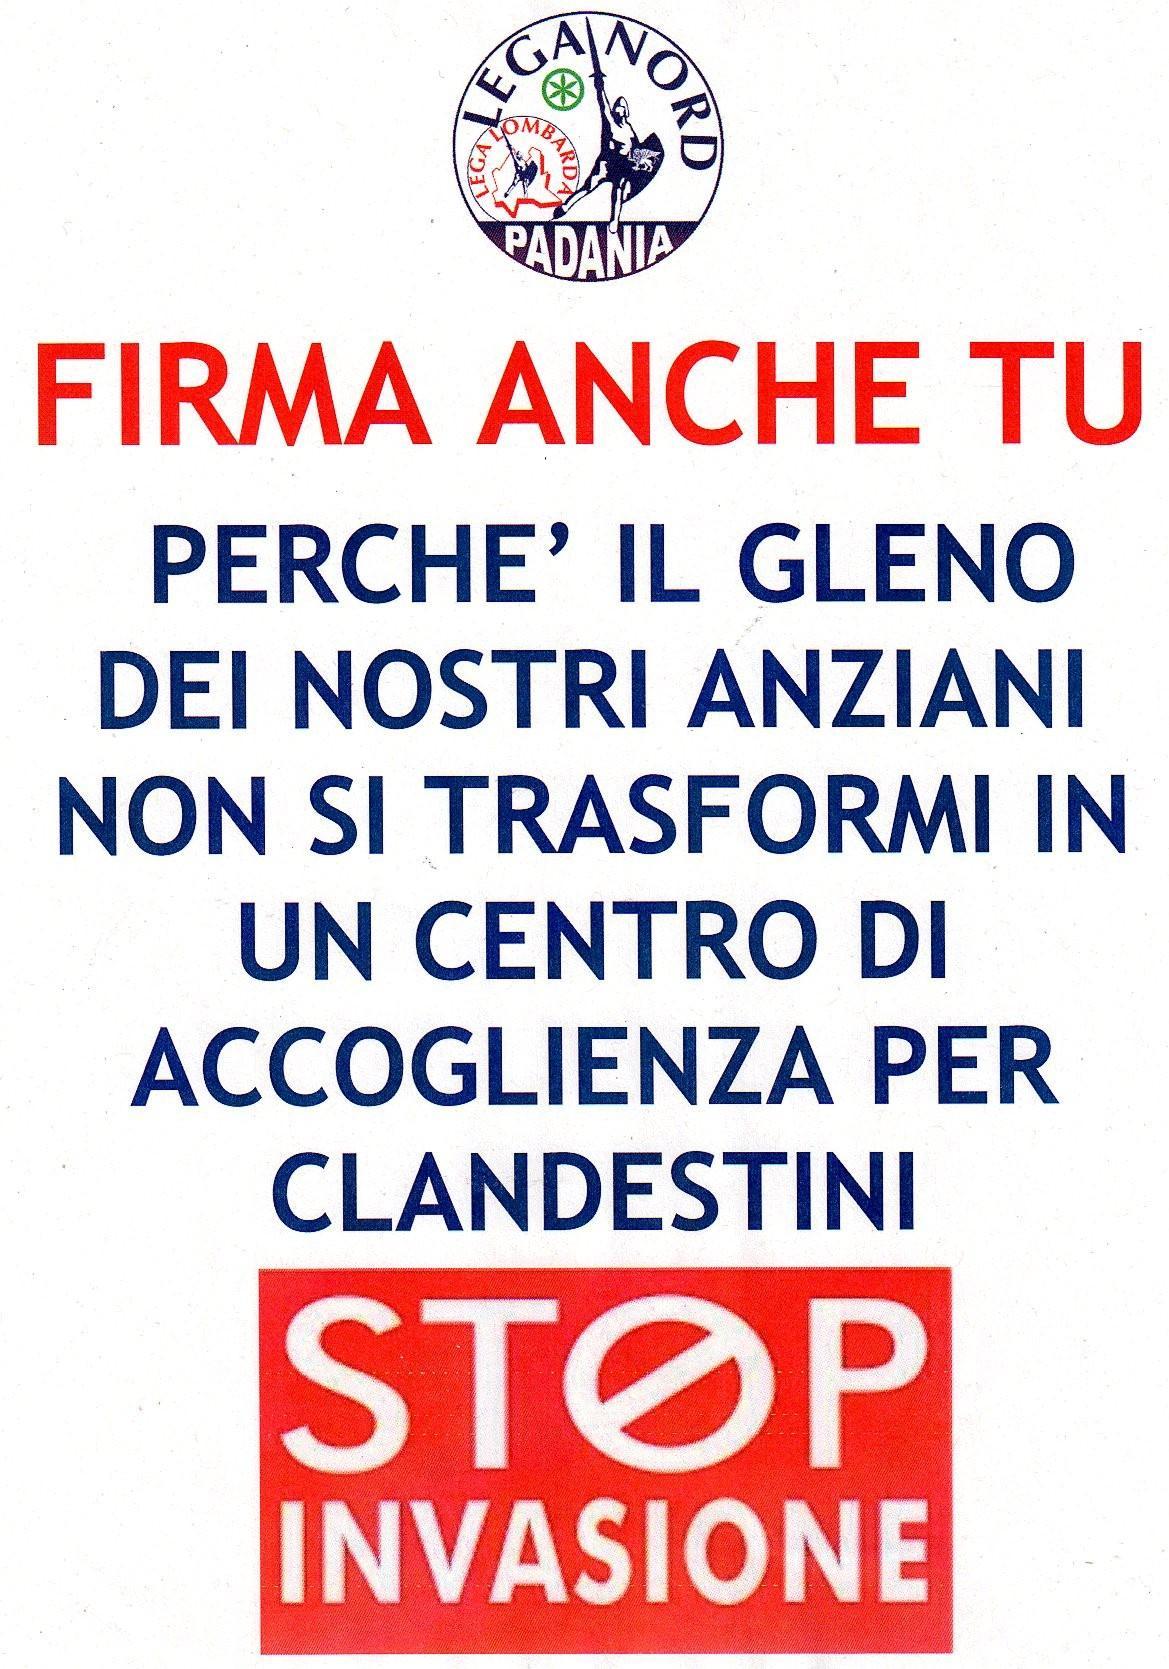 141205 manifesto firme Gleno